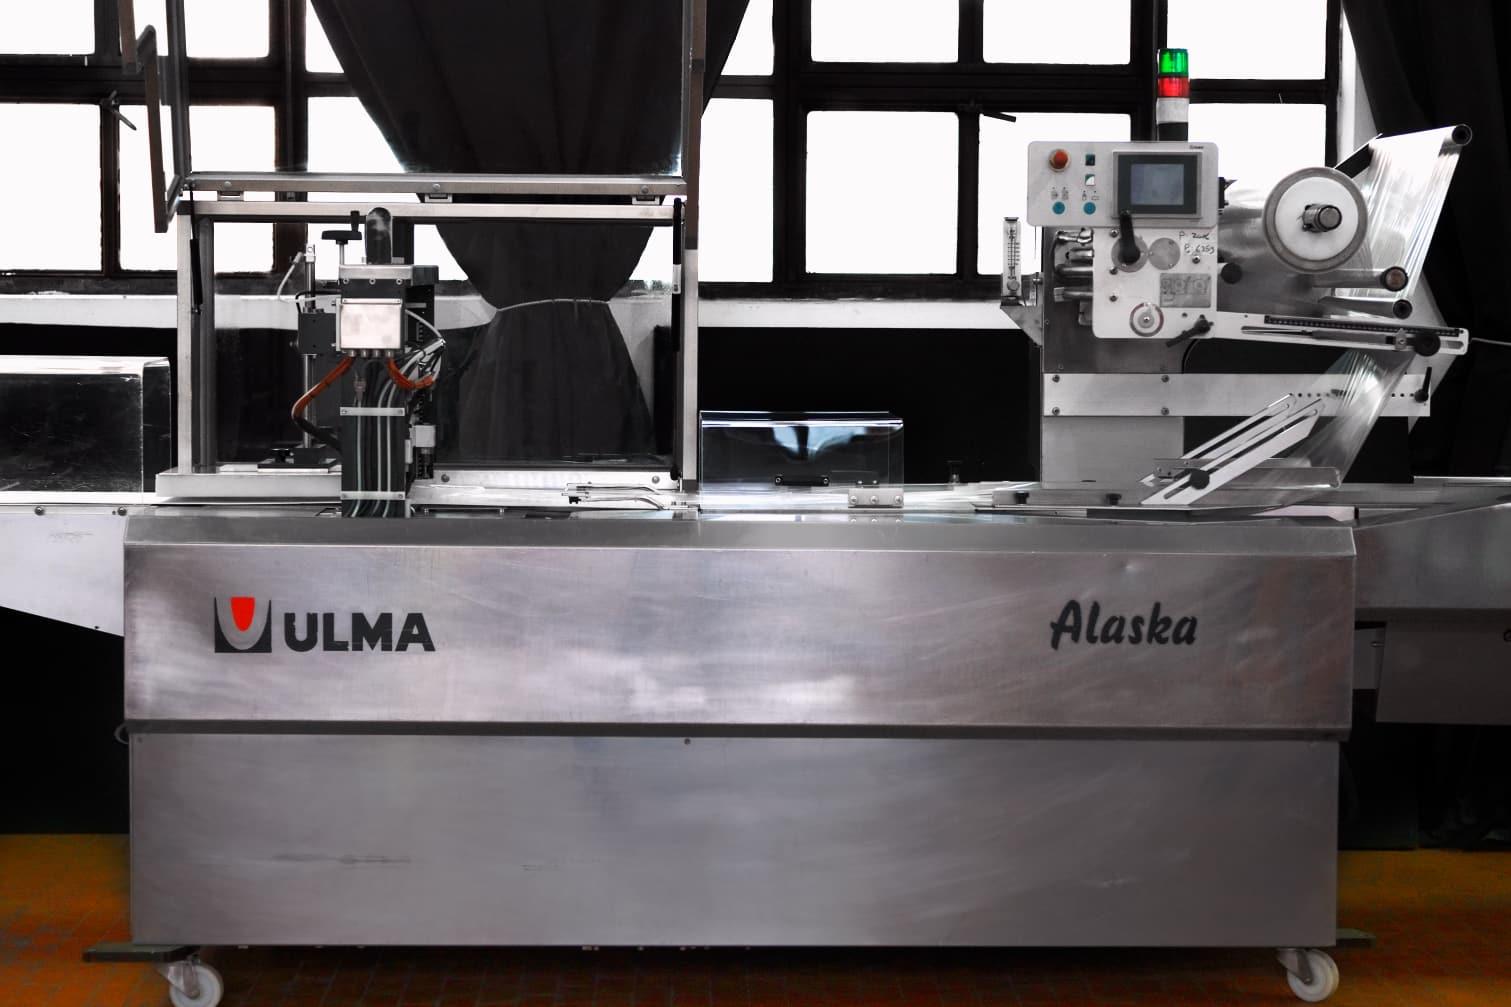 Confezionatrice Flow Pack Ulma Alaska_2